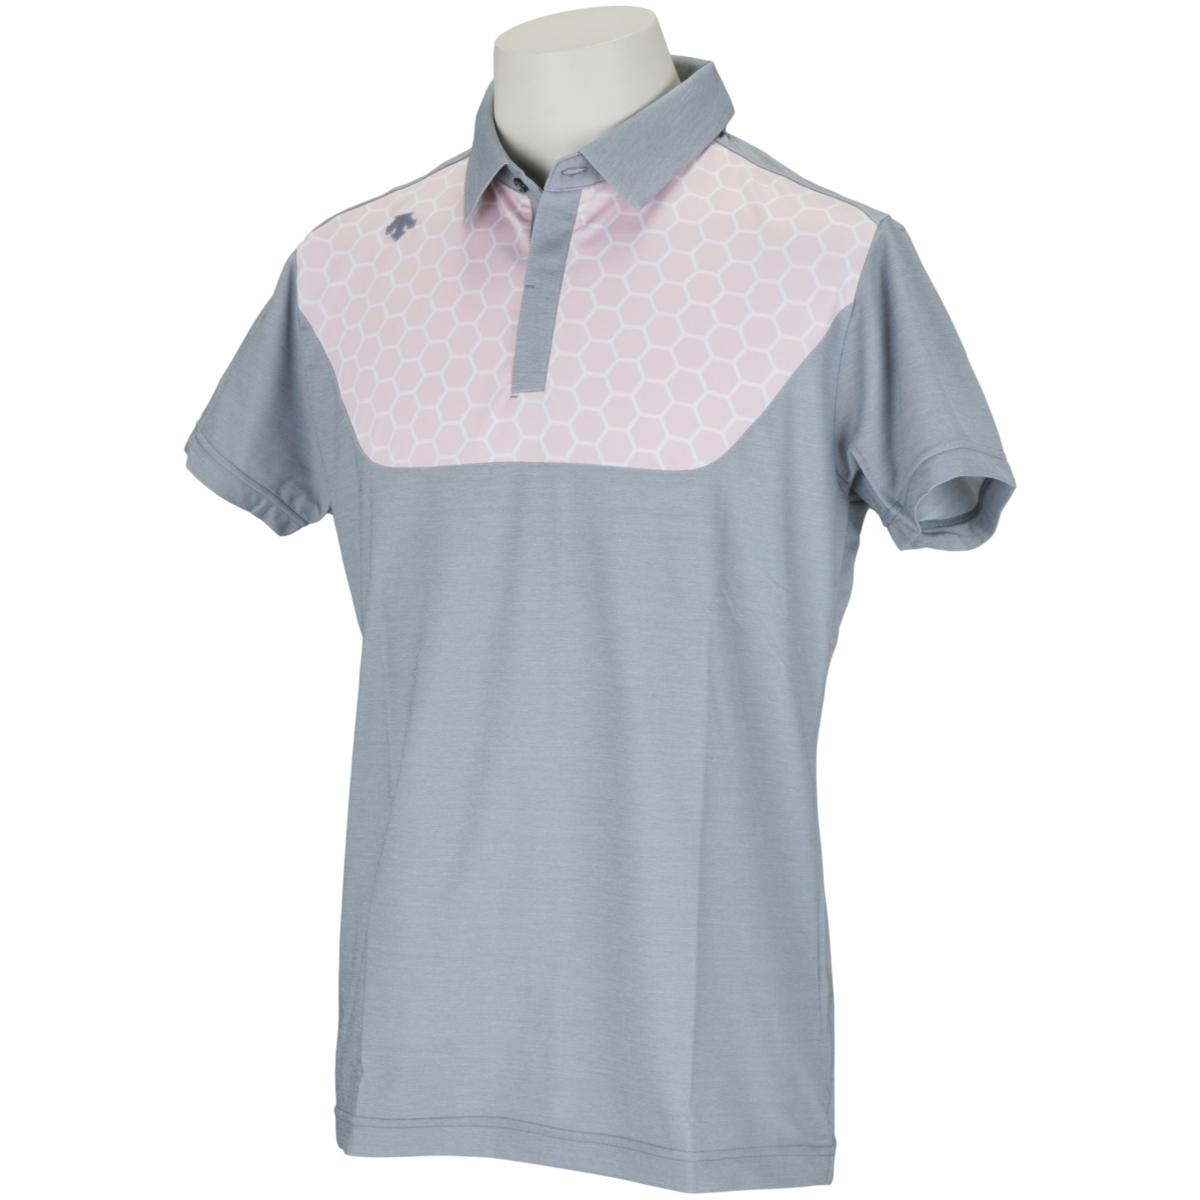 ECOアクセンシャルゼブラ鹿の子ISHIプリント 半袖ポロシャツ